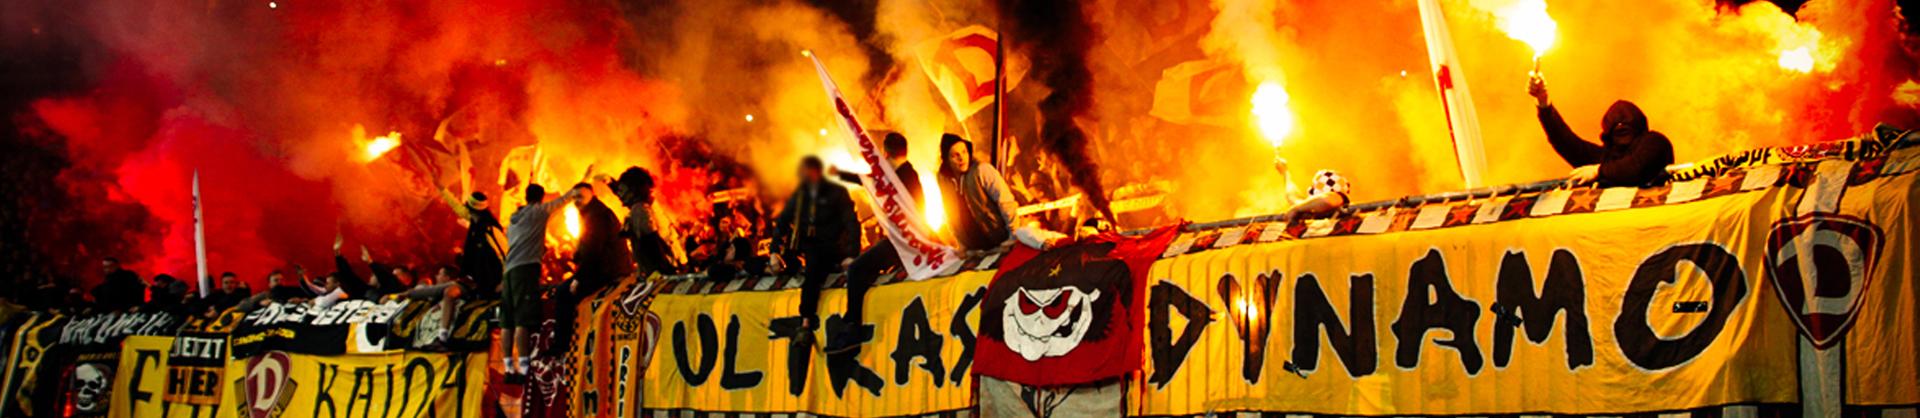 Dynamo Dresden: Mutmaßlicher Böllerwerfer identifiziert